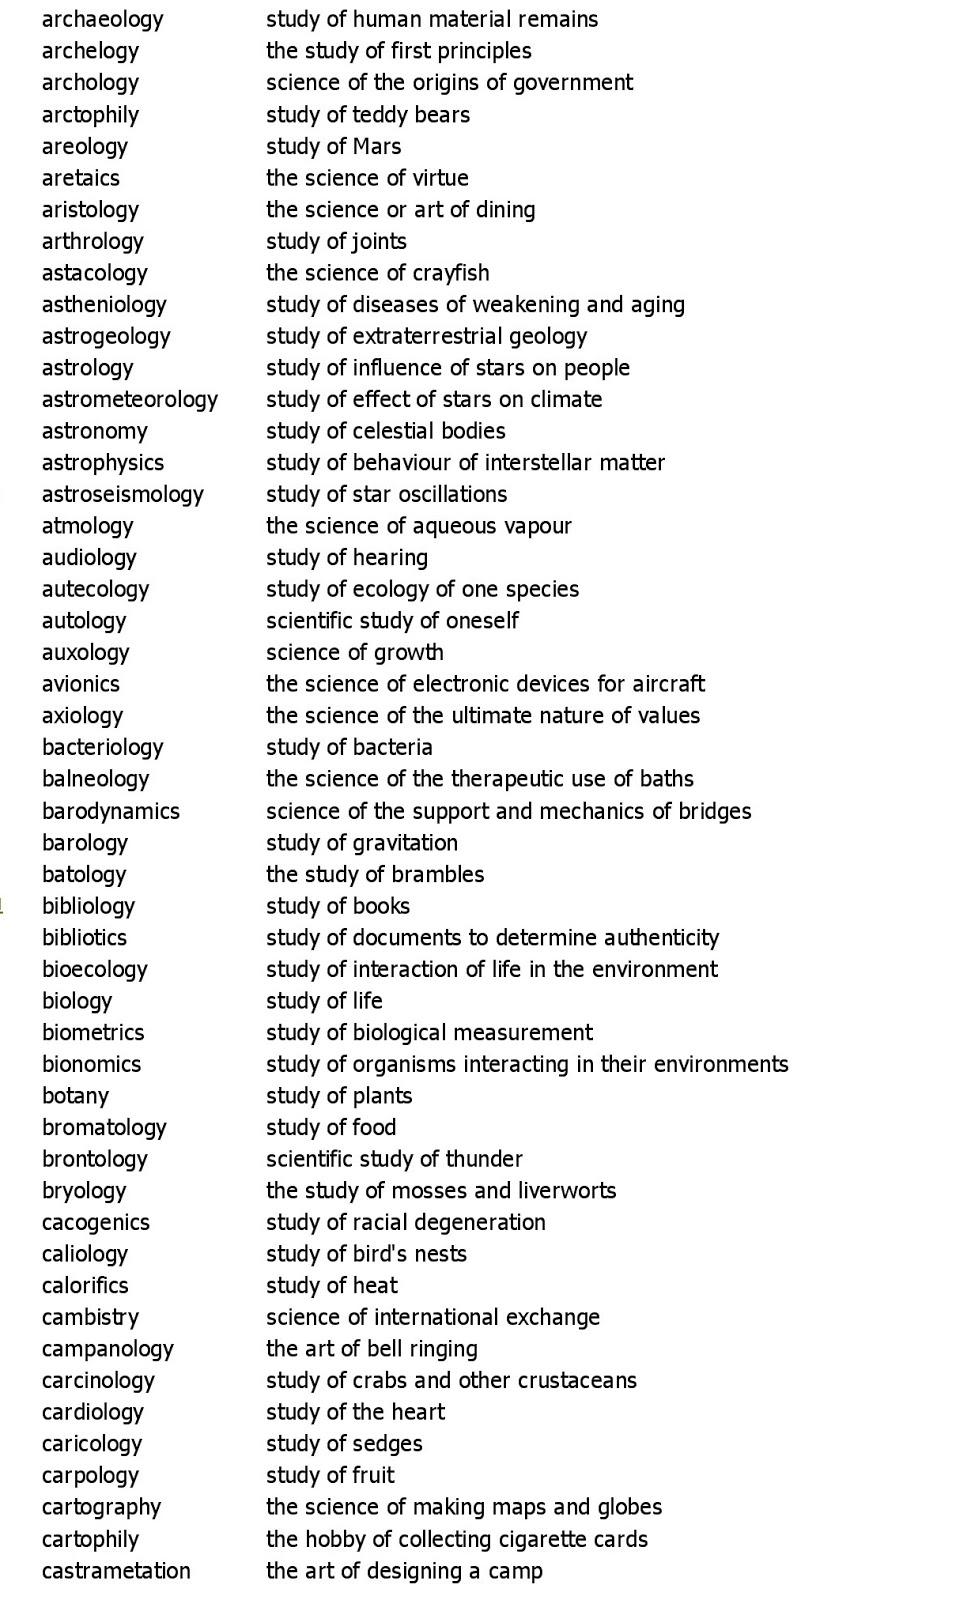 worksheet Words With Ology ology suffix words laptuoso worksheet wosenly free worksheet